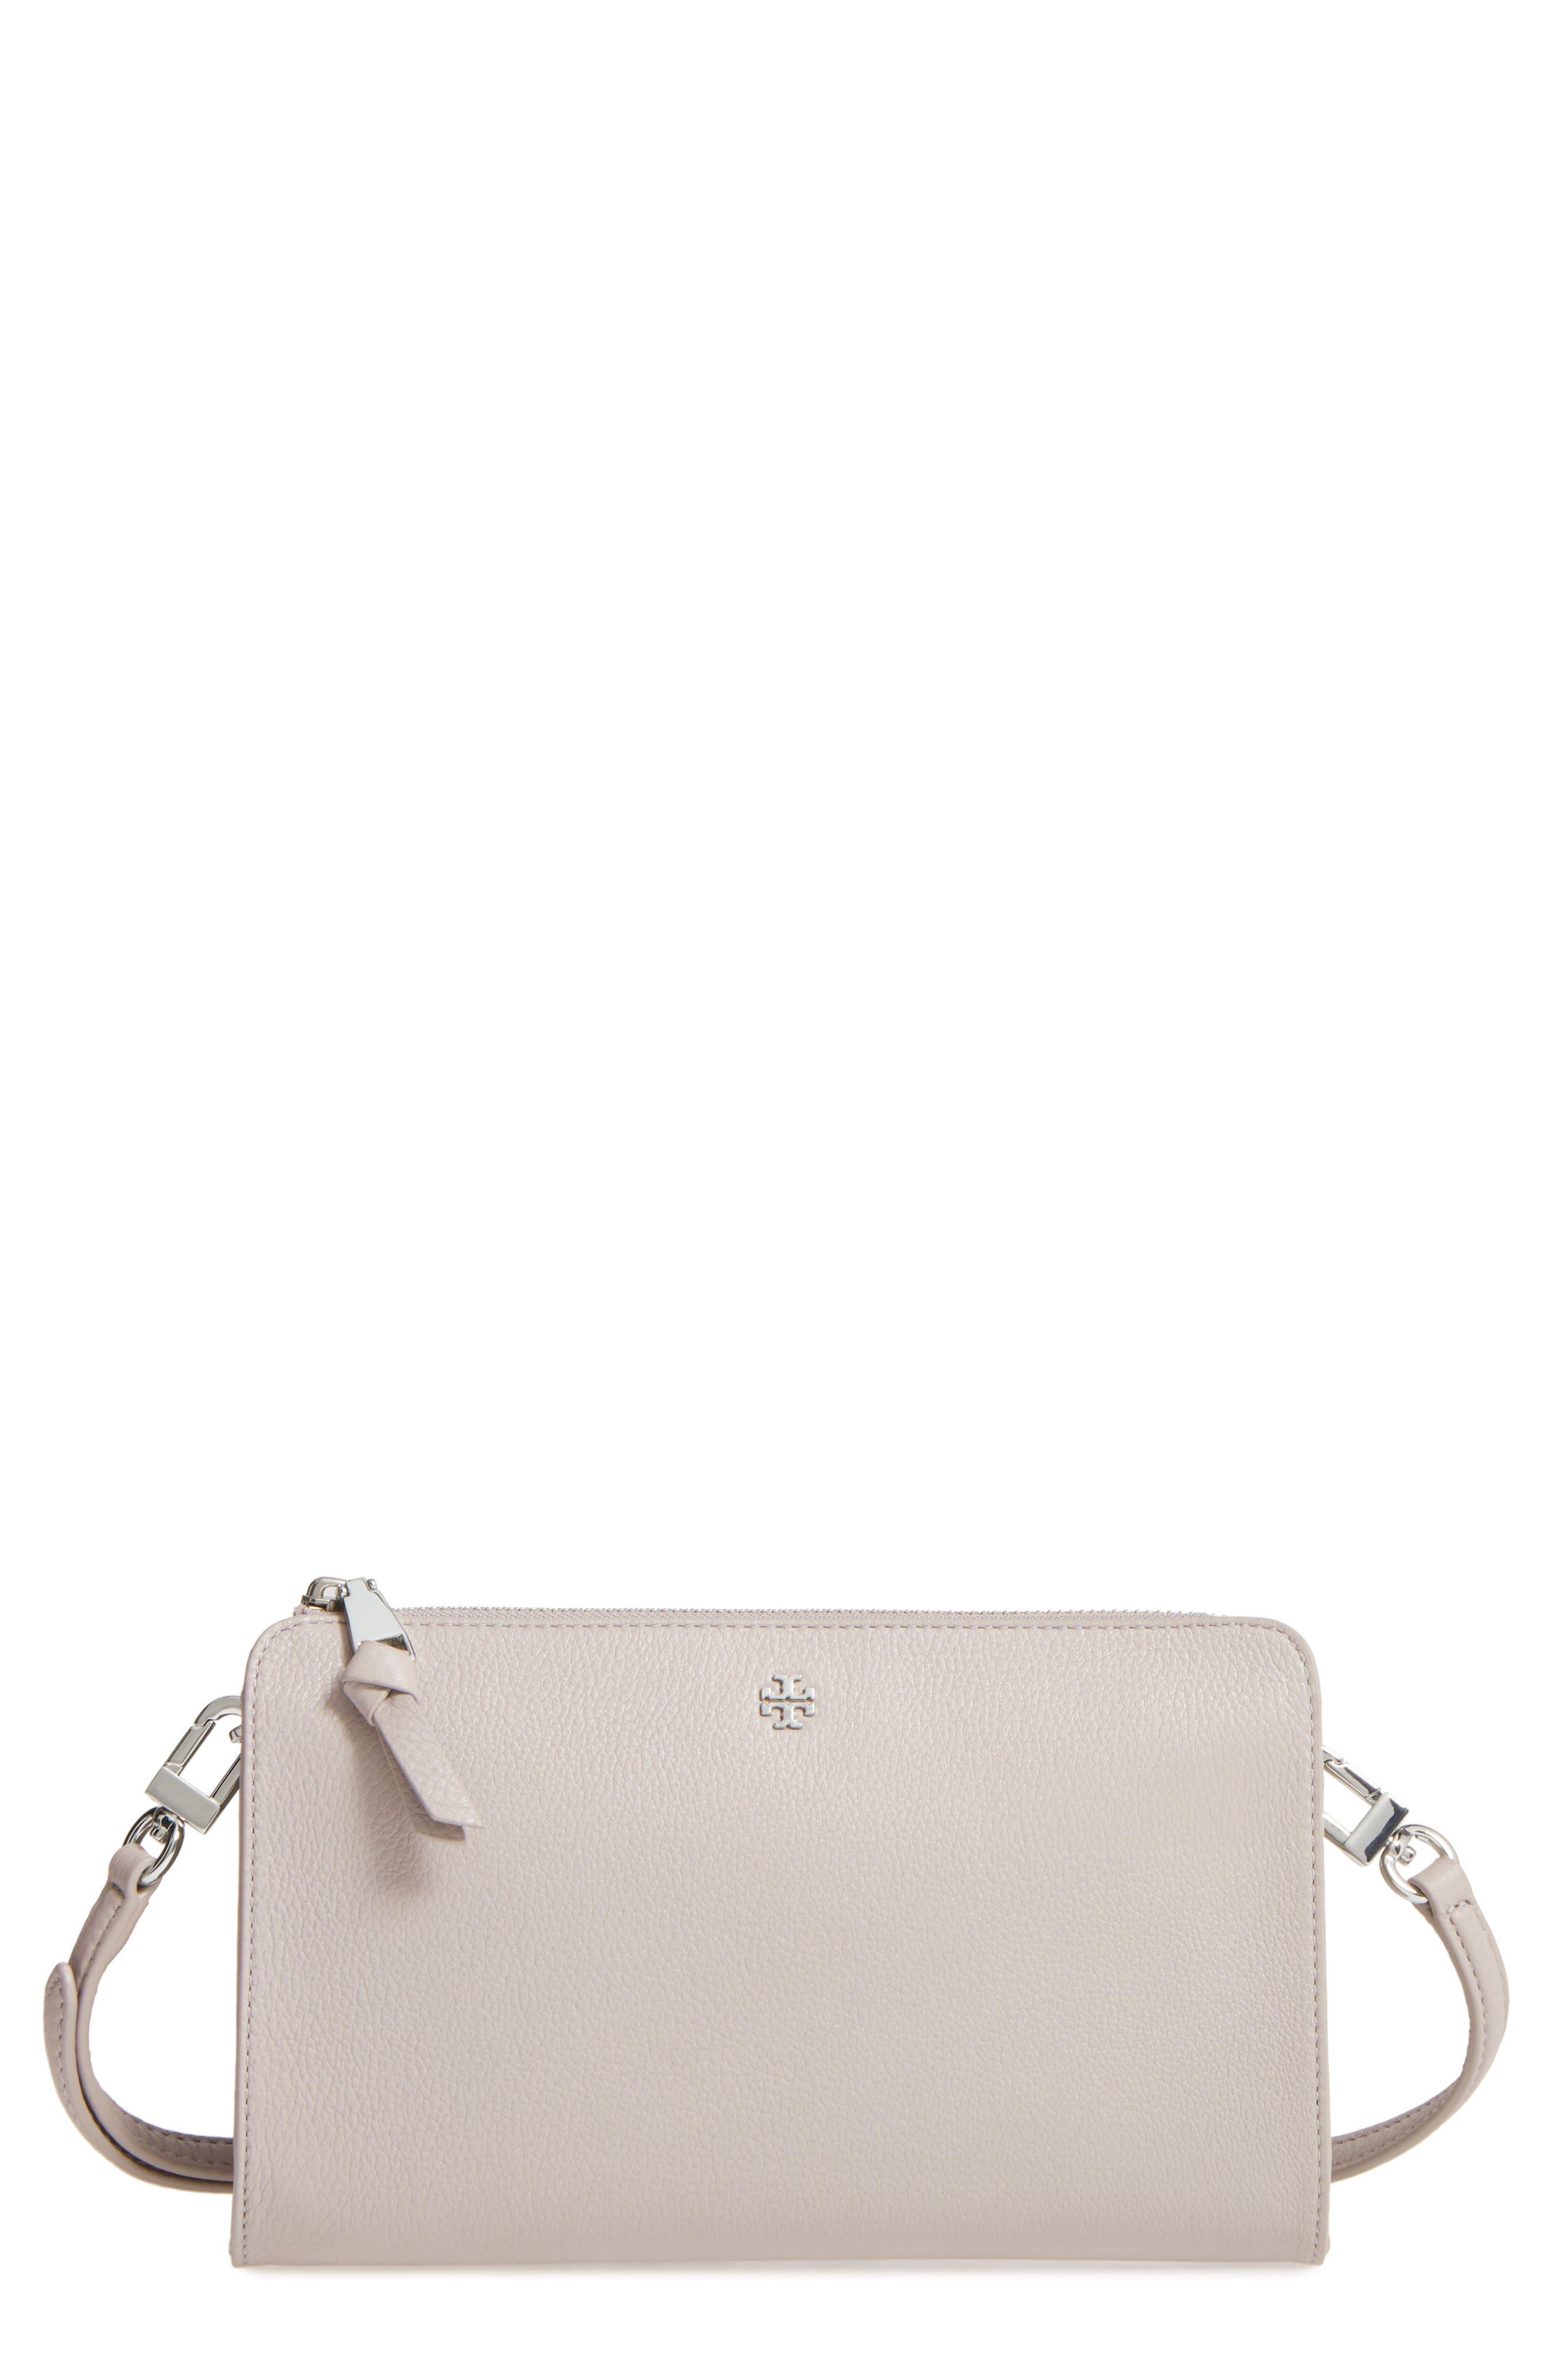 Tory Burch Robinson Leather Wallet/Crossbody Bag